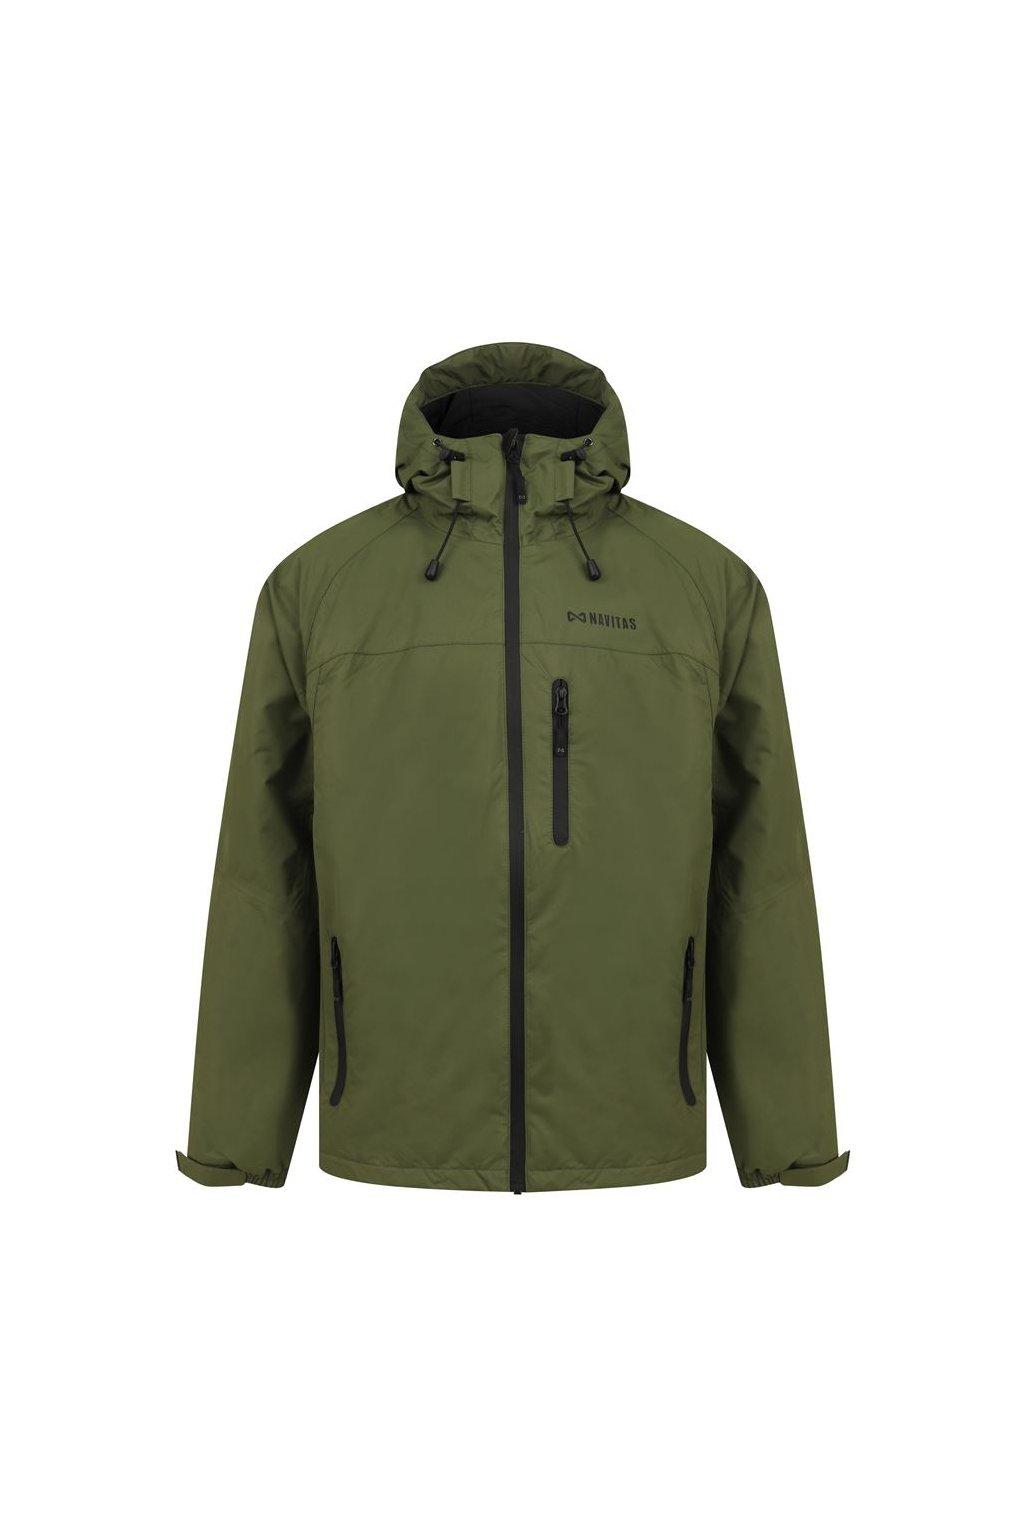 Navitas: Bunda Scout Jacket Green 2.0 Velikost L